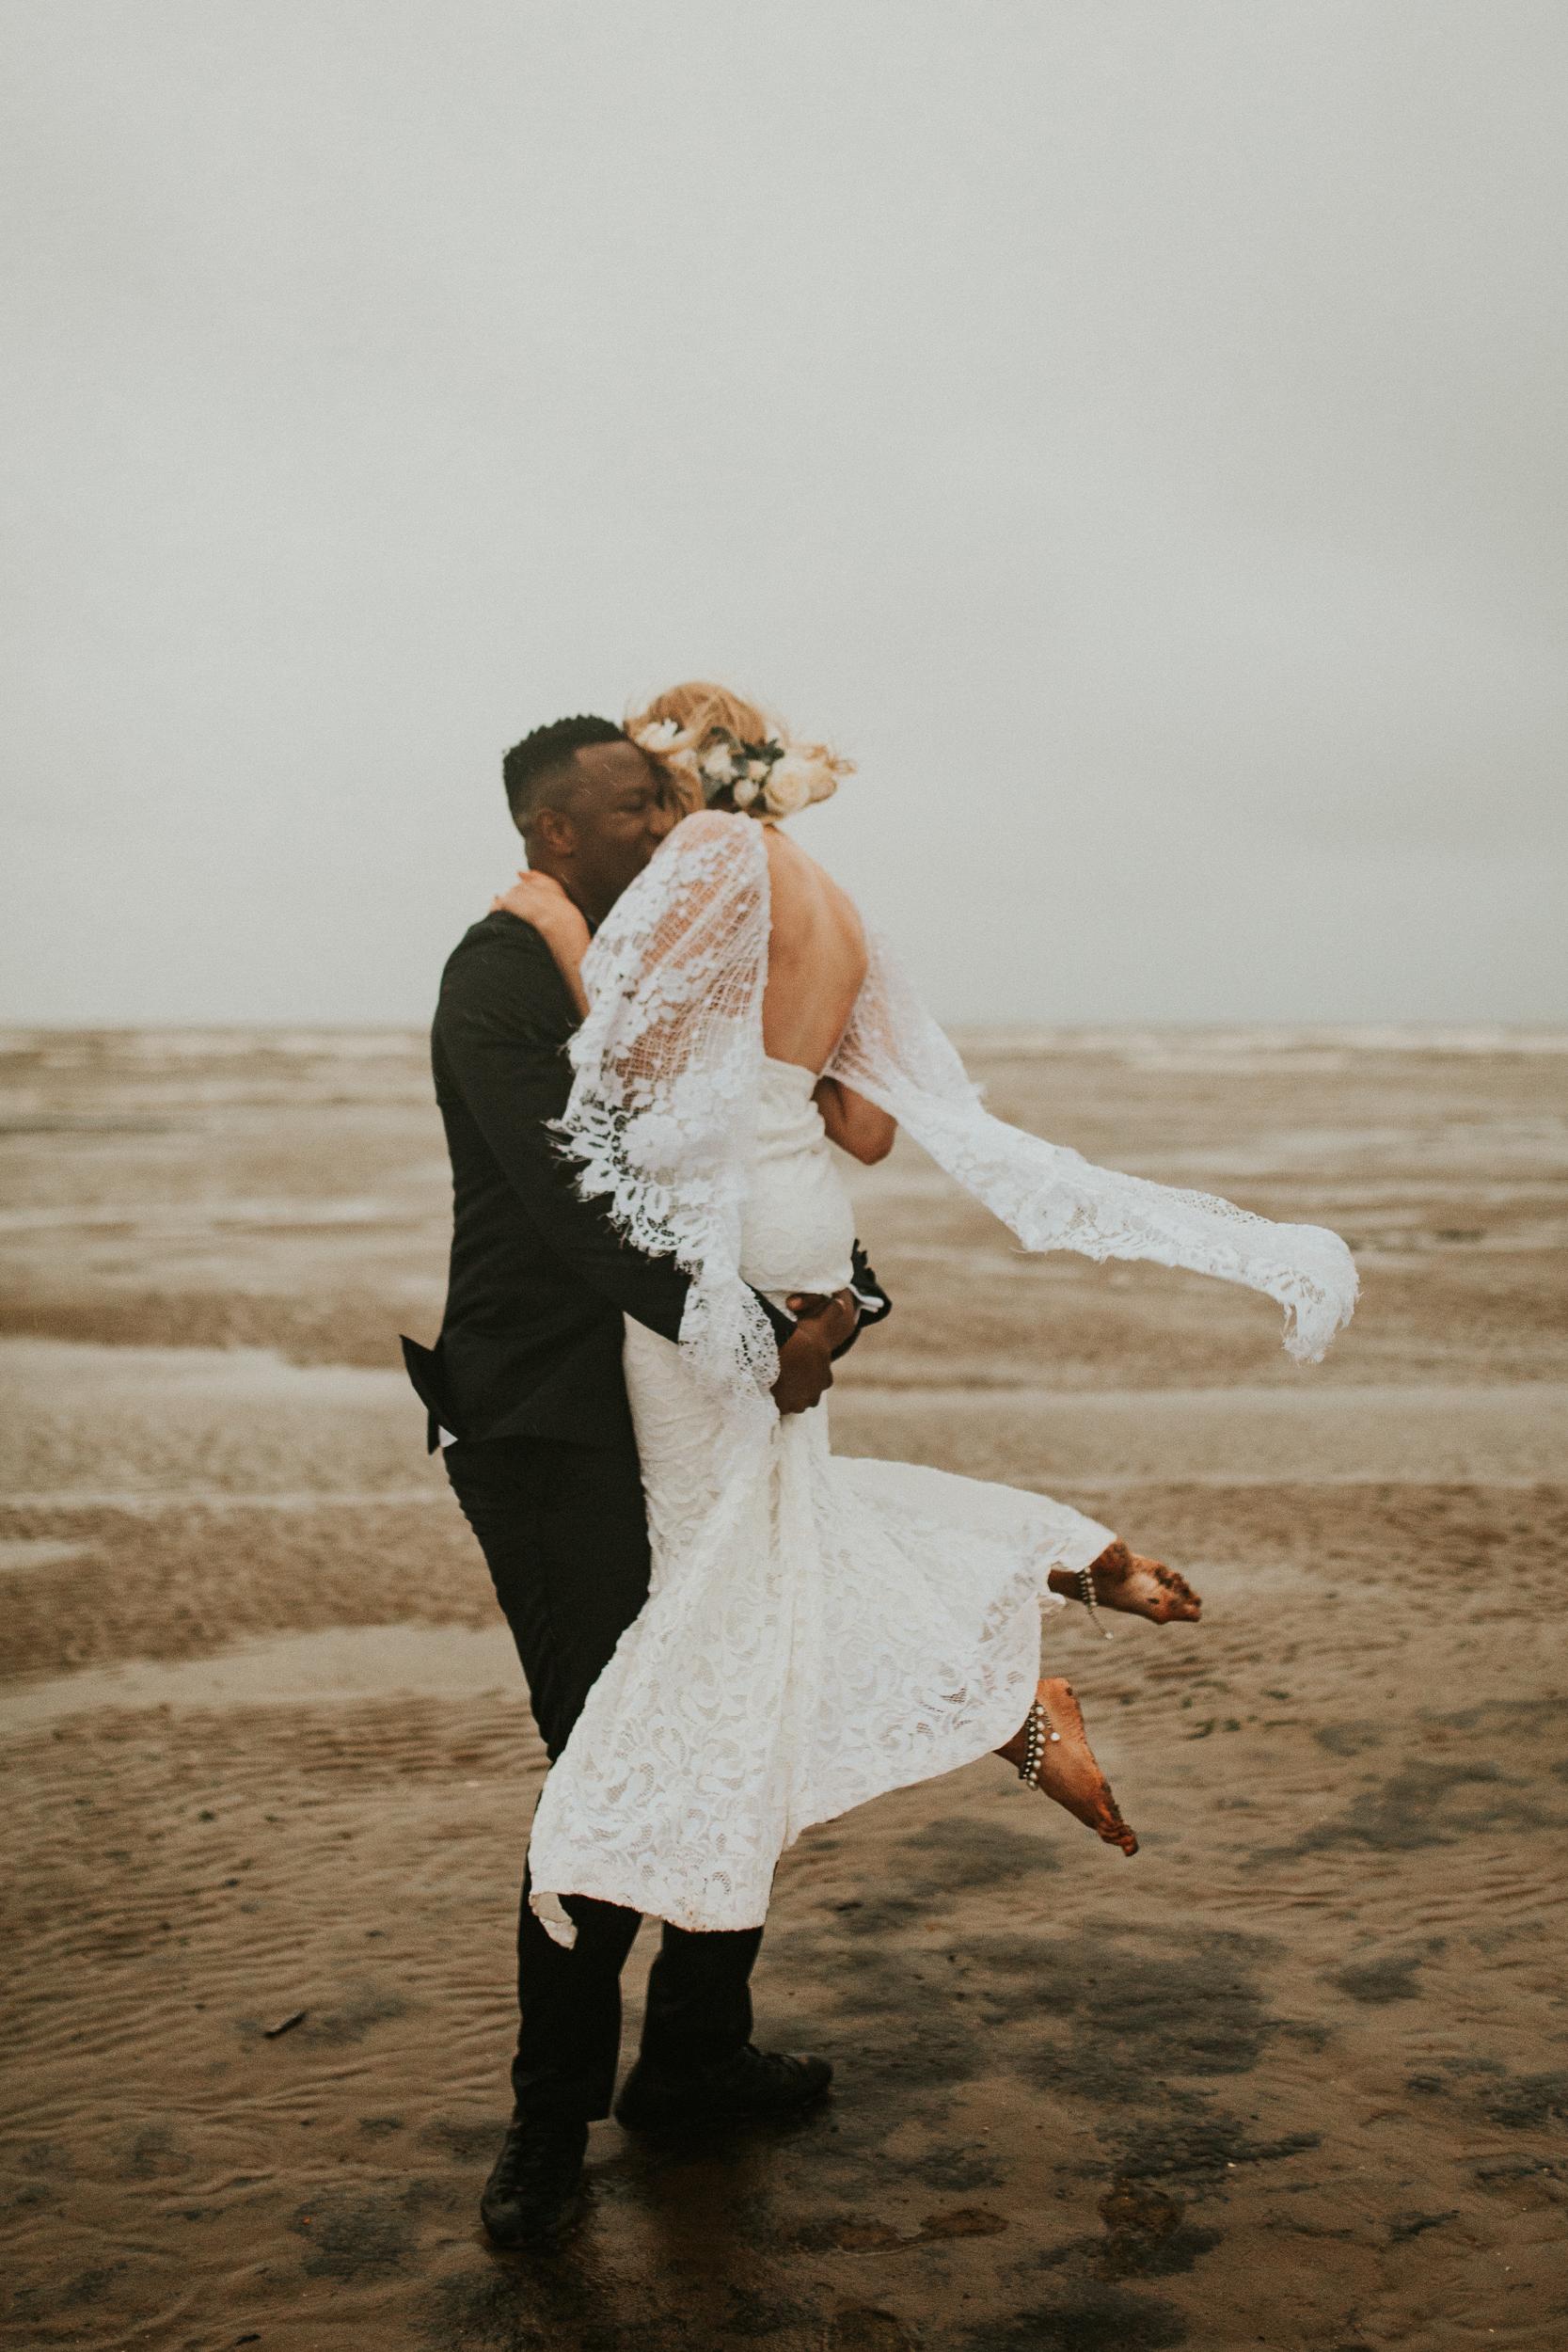 Emma-Tate-Stormy-Norfolk-Beach-Wedding-Shoot-Darina-Stoda-Photography-44.jpg